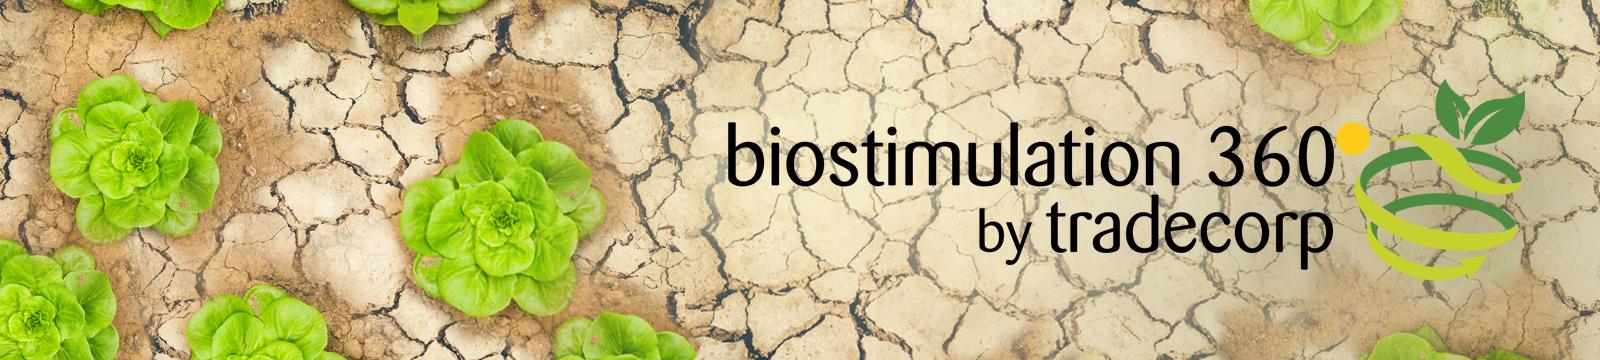 Tradecorp präsentiert Biostimulation 360º !